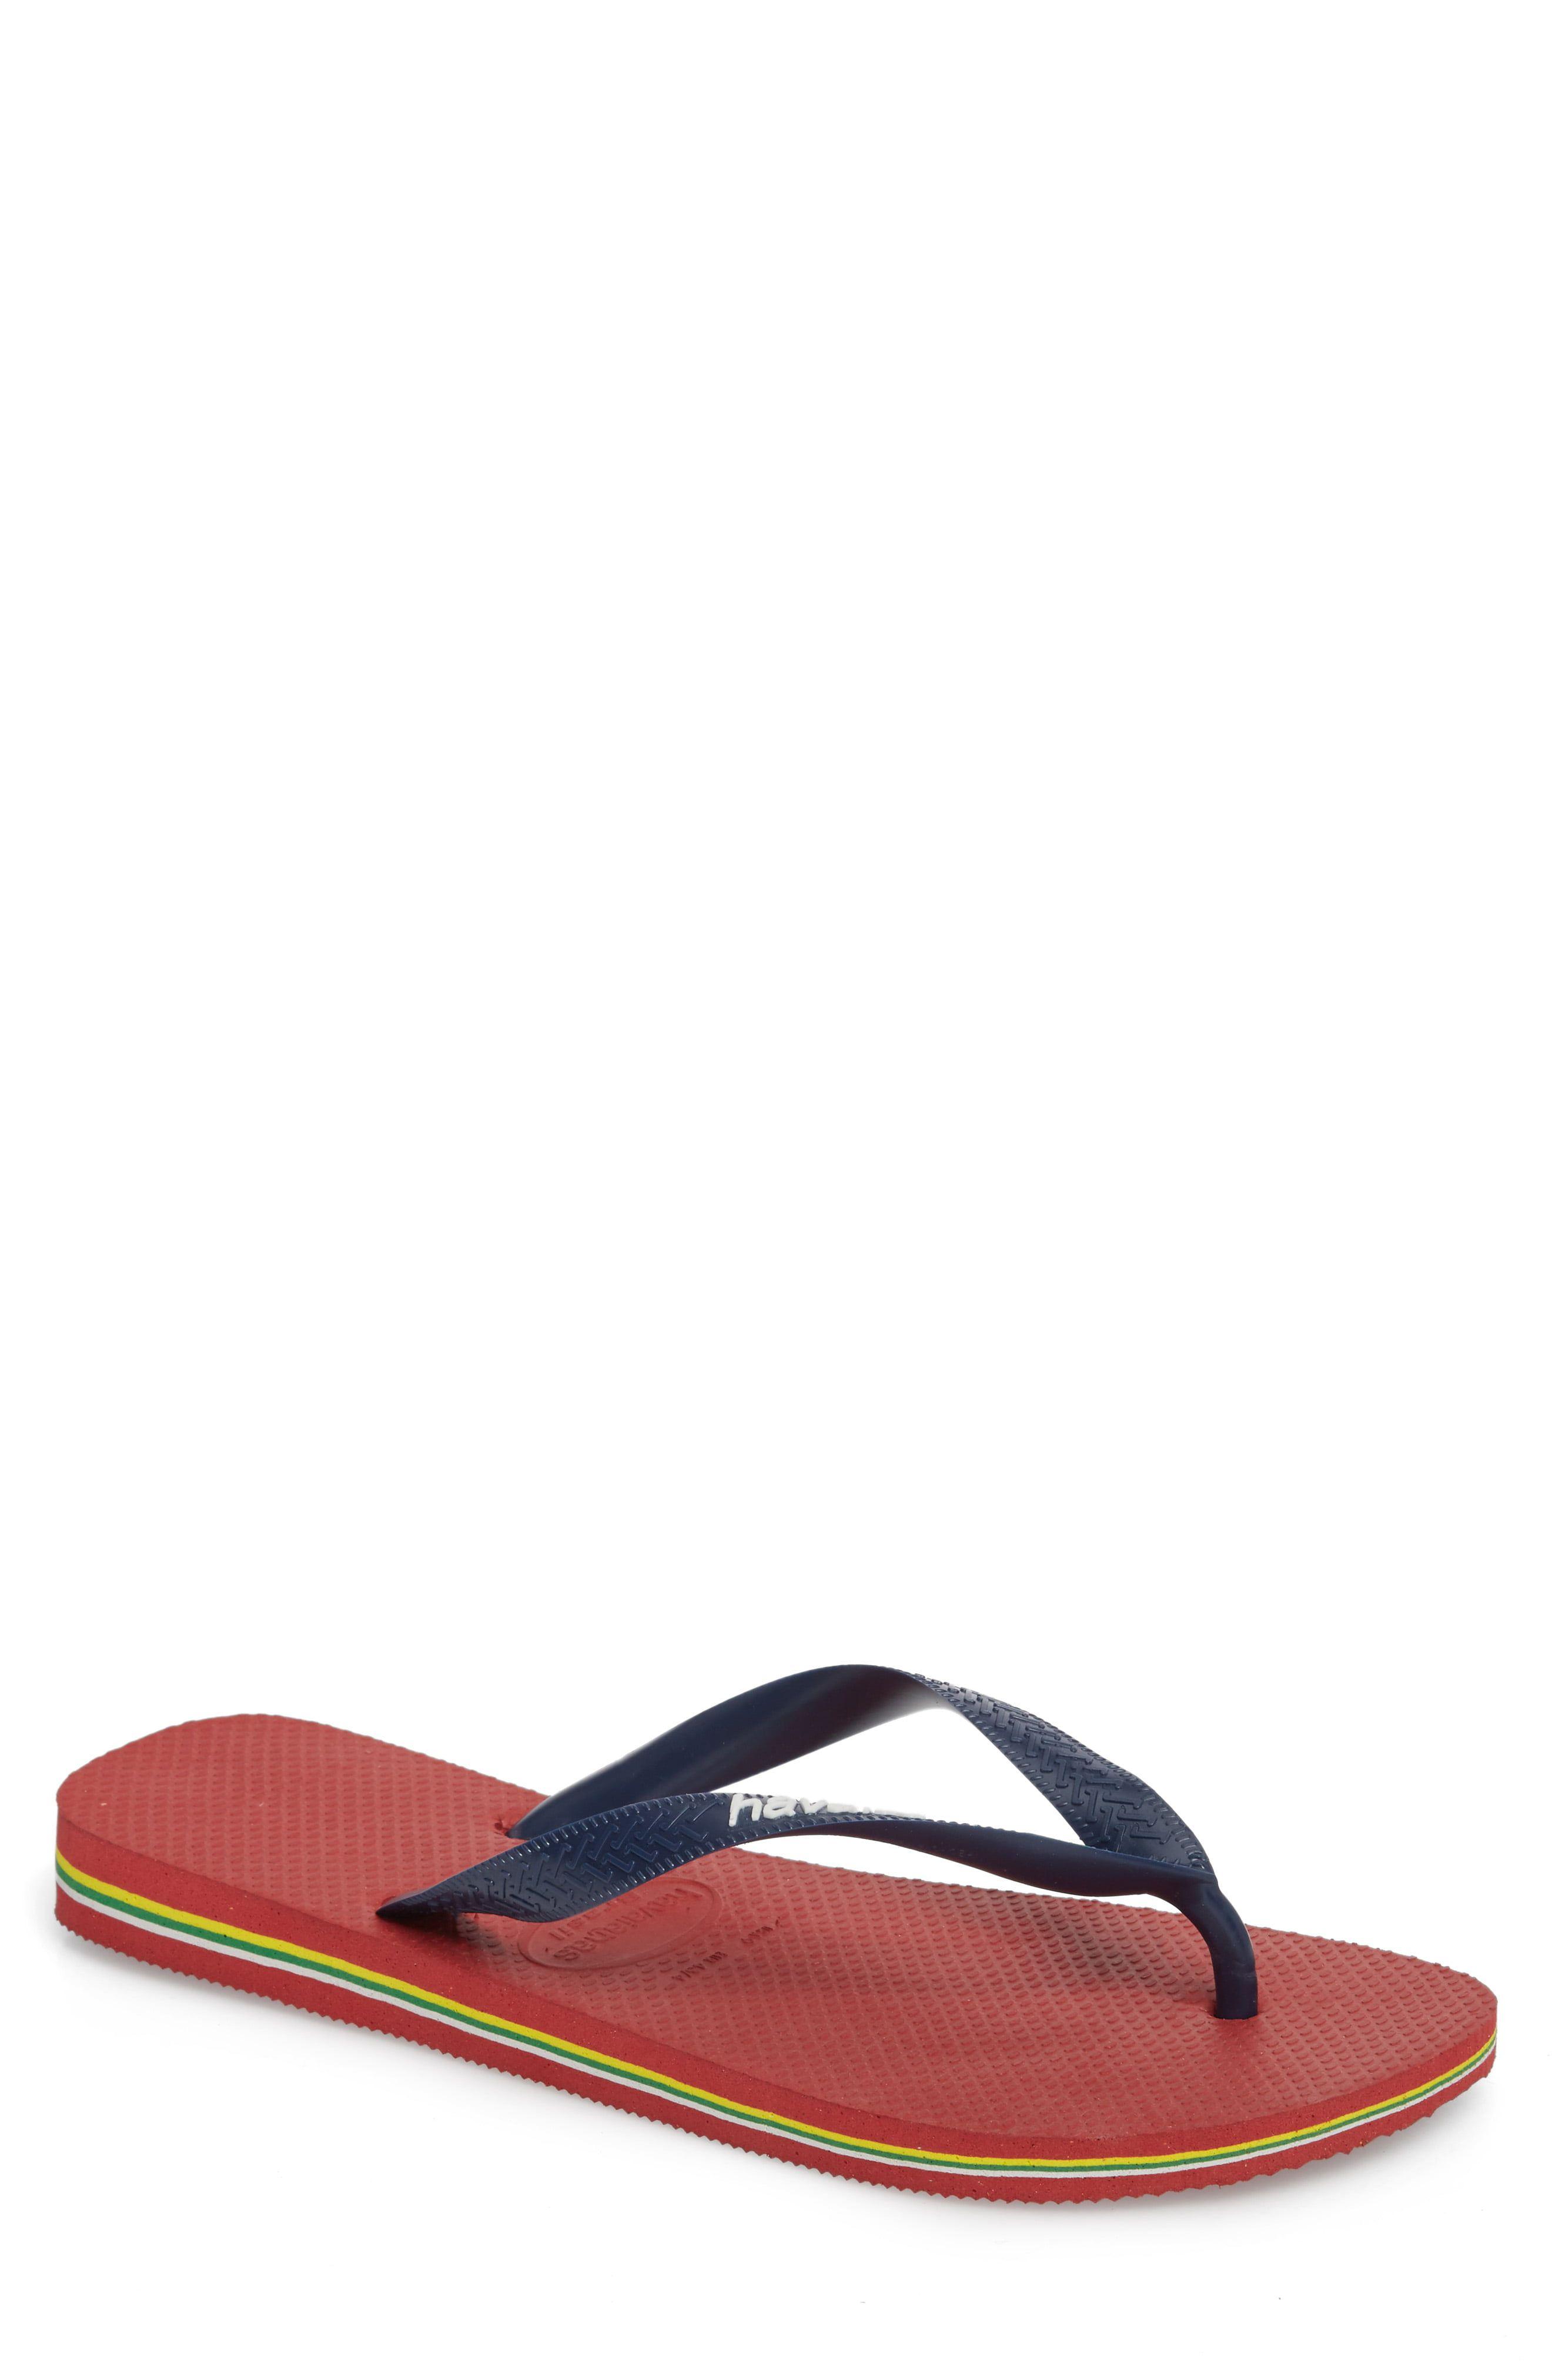 28f0c7db8b6c HAVAIANAS HAVAIANAS MEN S URBAN CRAFT SANDAL ICE GREY.  havaianas  shoes